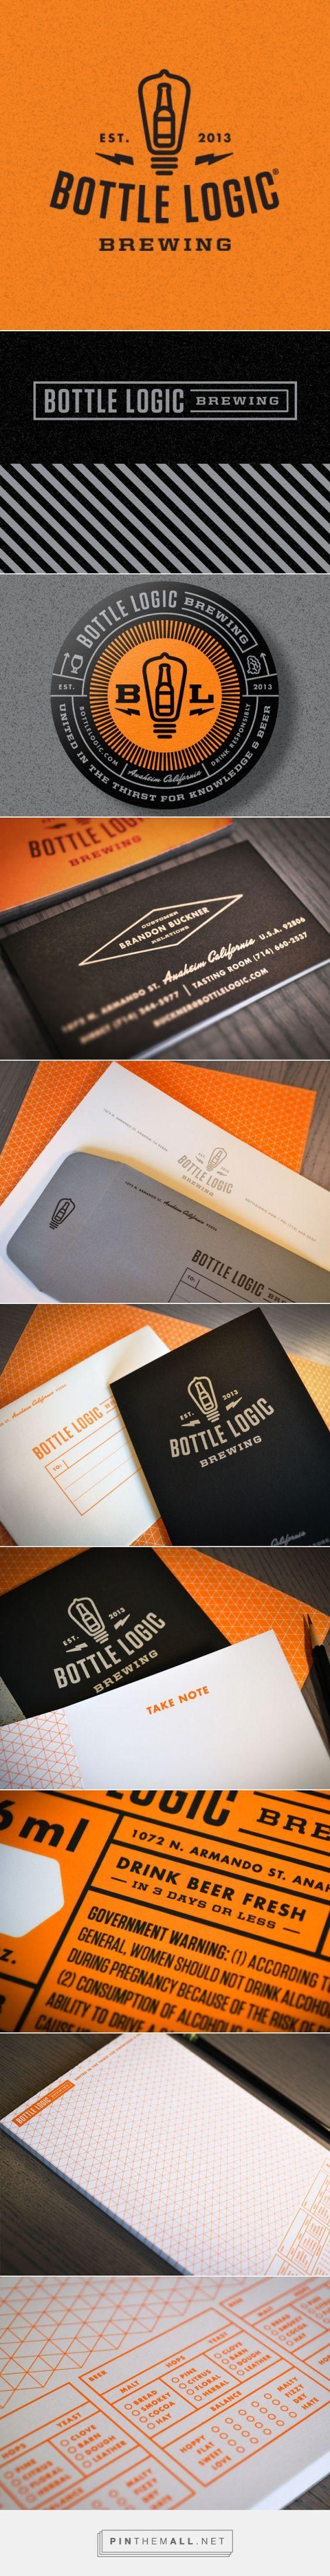 Bottle Logic Brewing Branding | Fivestar Branding – Design and Branding Agency & Inspiration Gallery